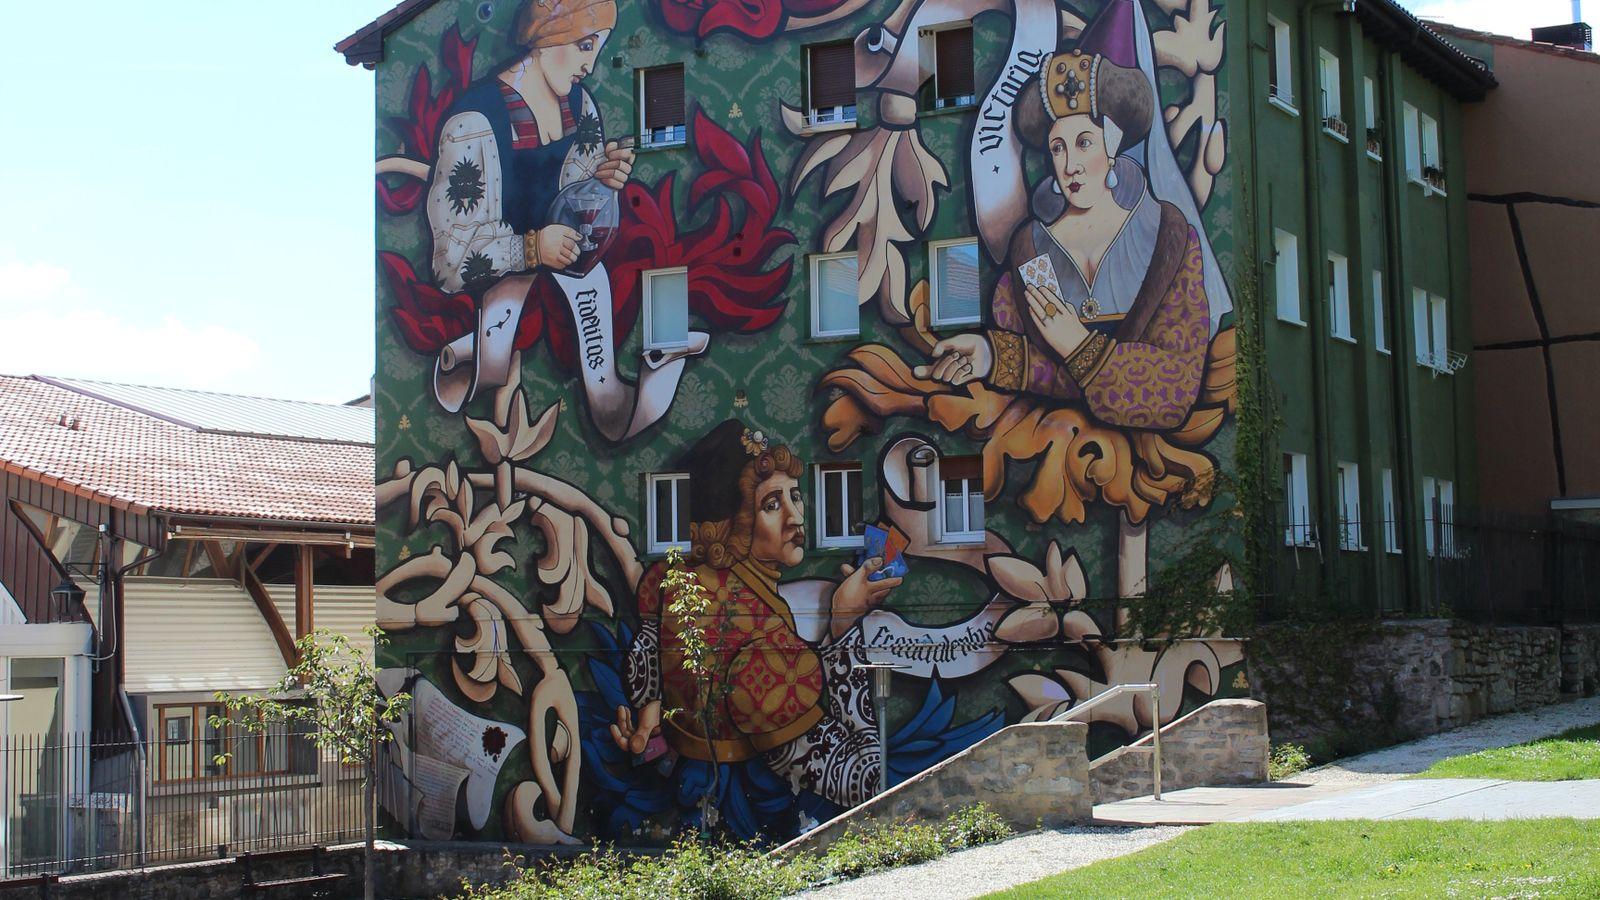 Foto: El tiempo en Vitoria-Gasteiz. (C.C./Roderich Kahn)